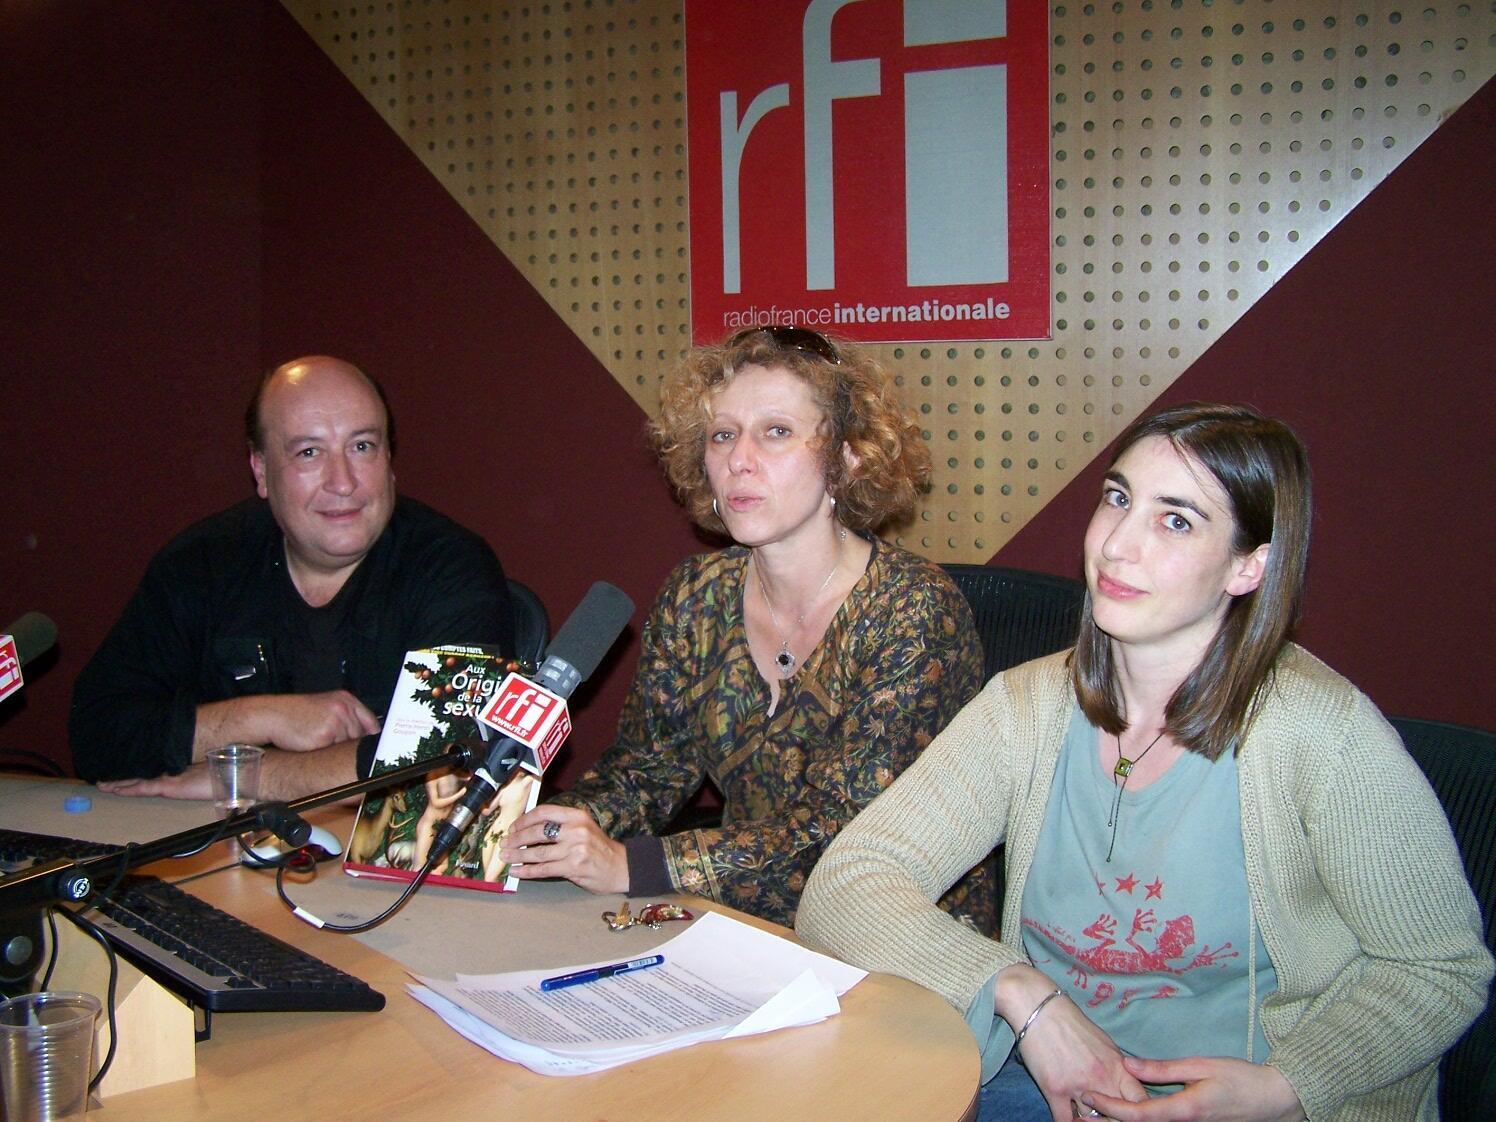 Pierre Henri Gouyon et Tatiana Giraud autour de Caroline Lachowsky